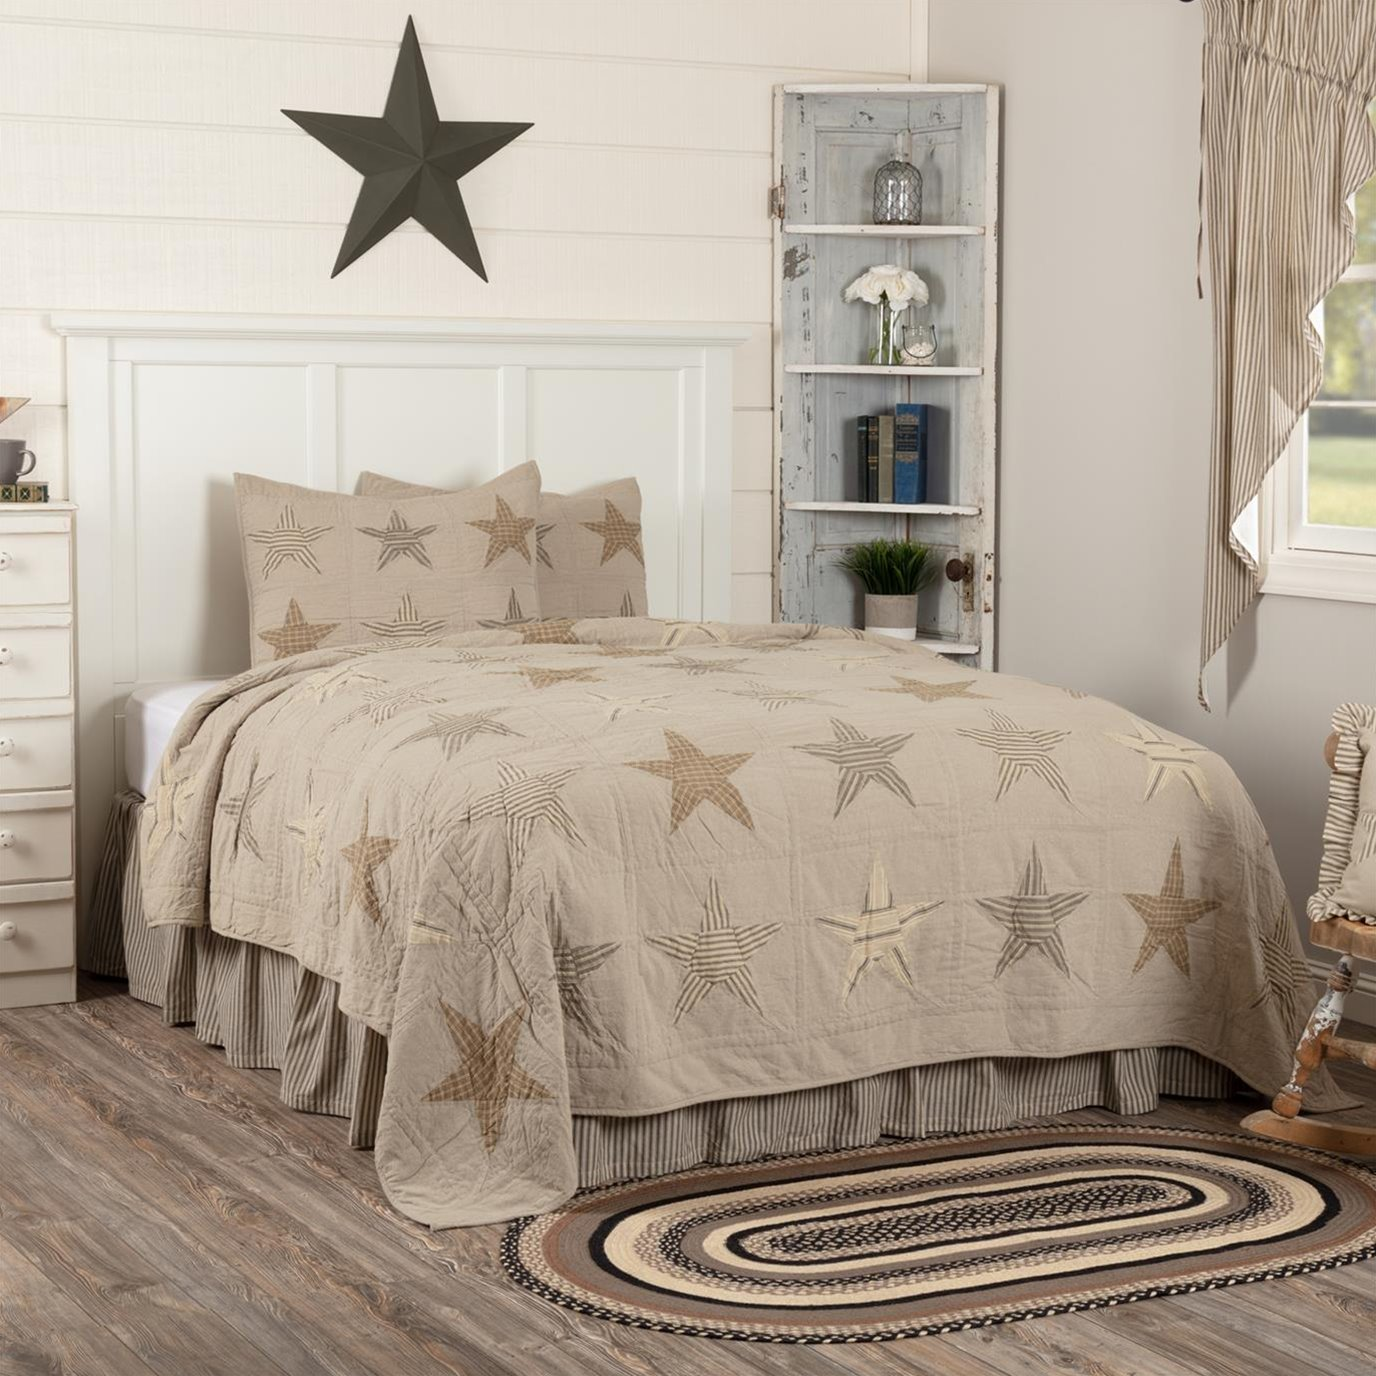 Sawyer Mill Star Charcoal Queen Quilt Set; 1-Quilt 90Wx90L w/2 Shams 21x27